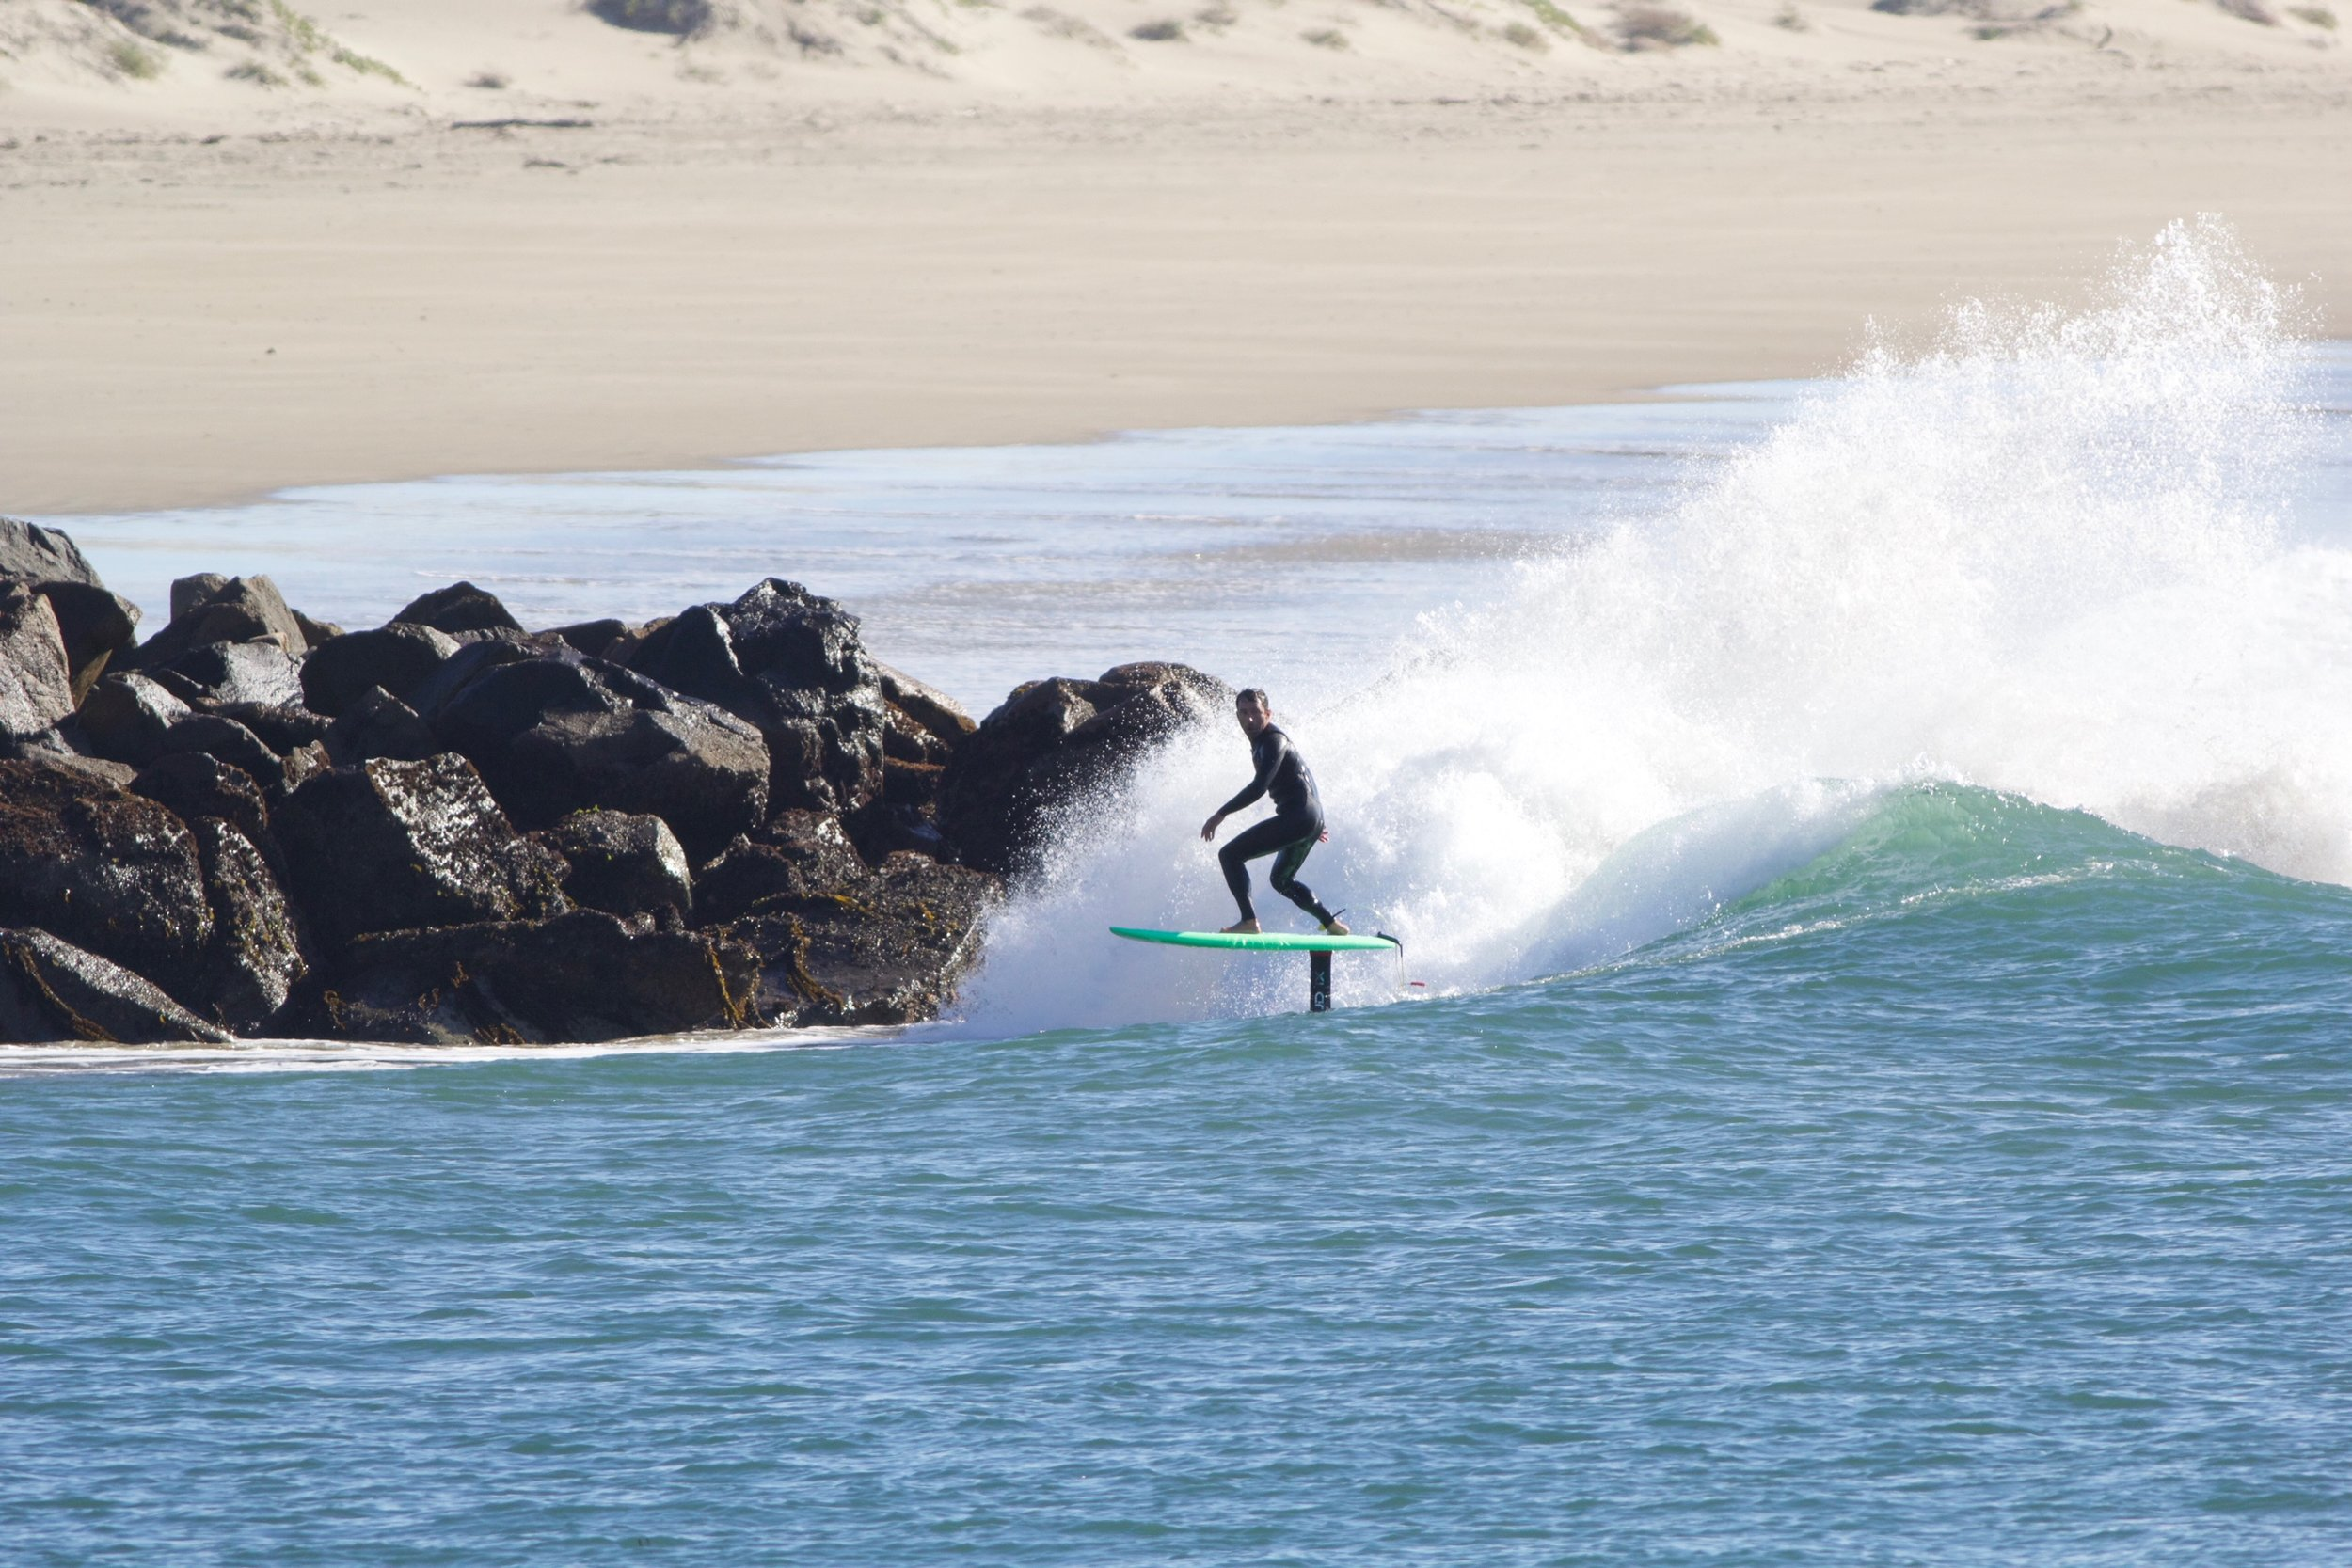 Fletch Foil_FCD Surfboards_Coud 9 Surffoils.JPG